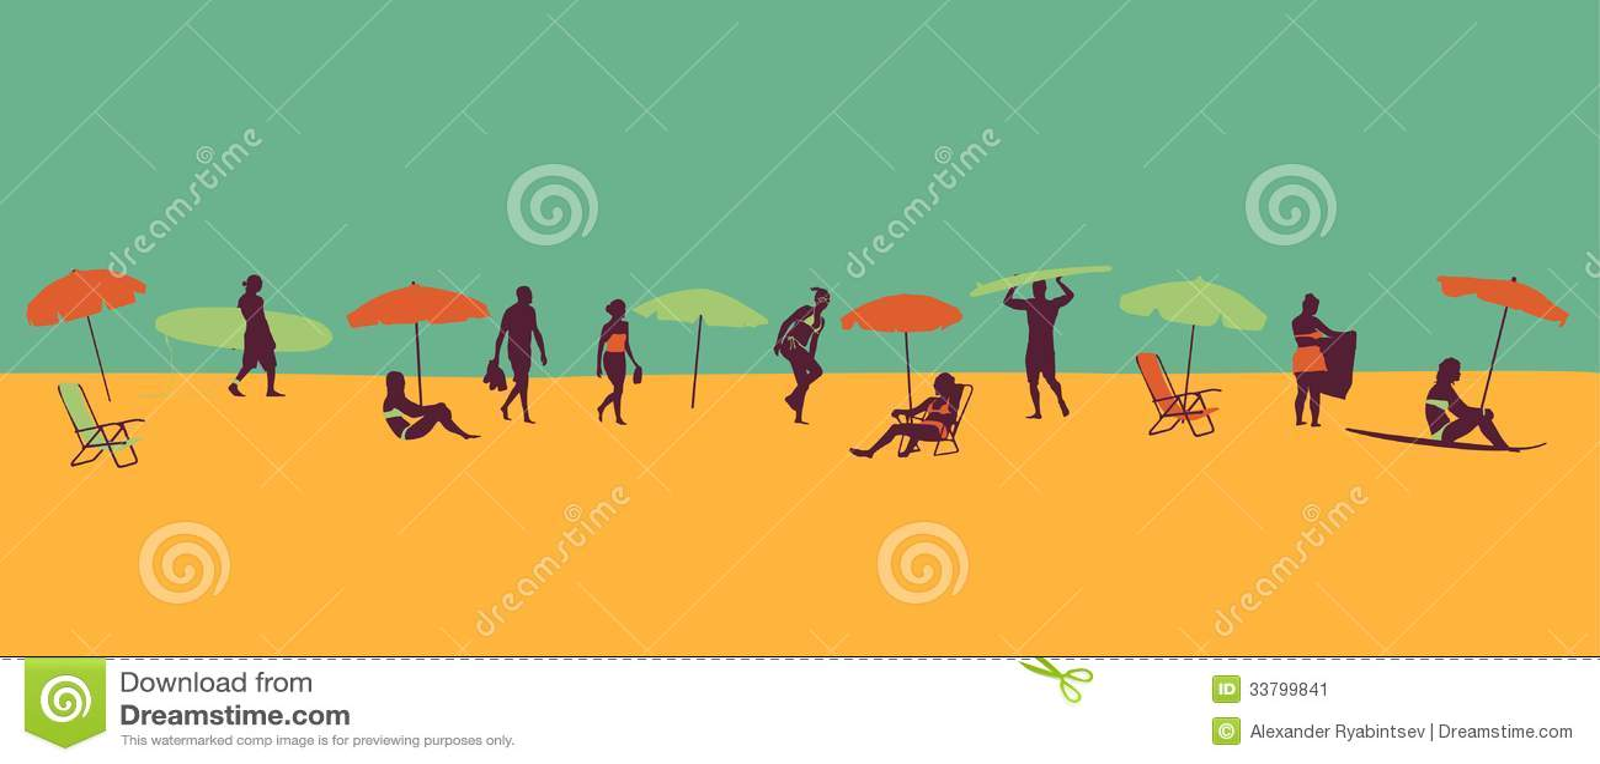 Beach Theme Illustration In Vintage Style Stock Image ...